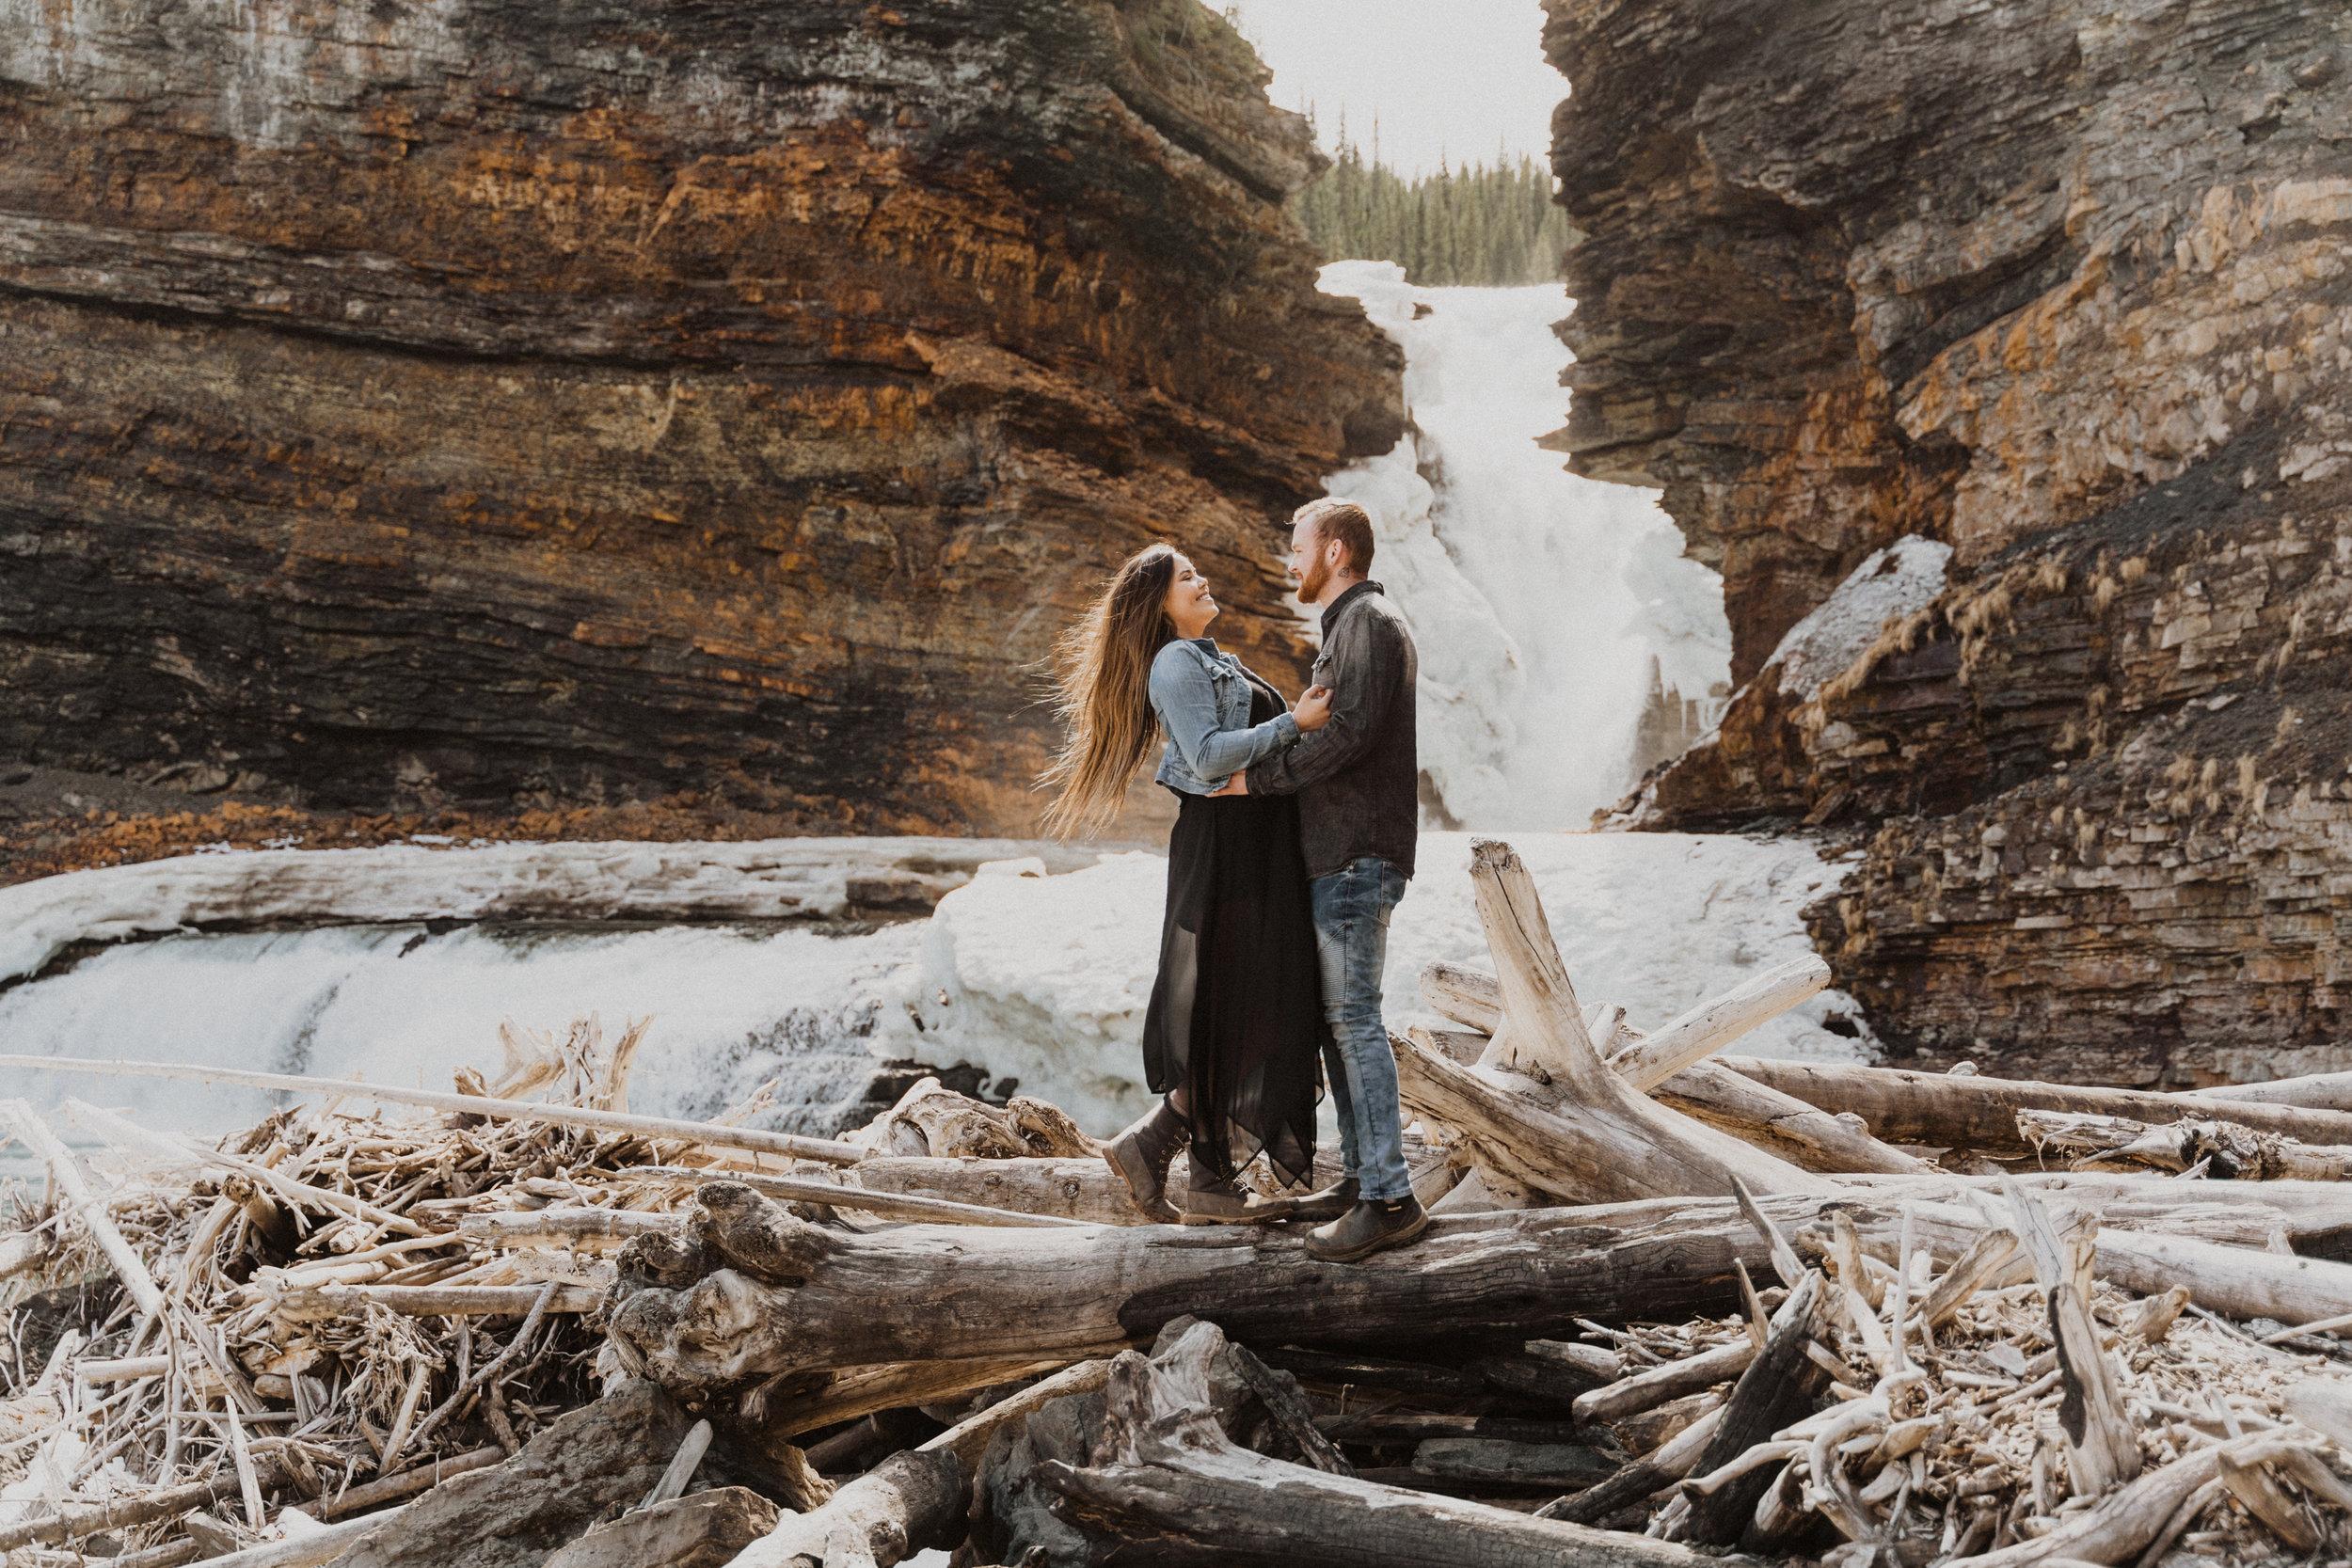 tyraephotography_photographer_wedding_elopement_engagement_photography-04387.jpg